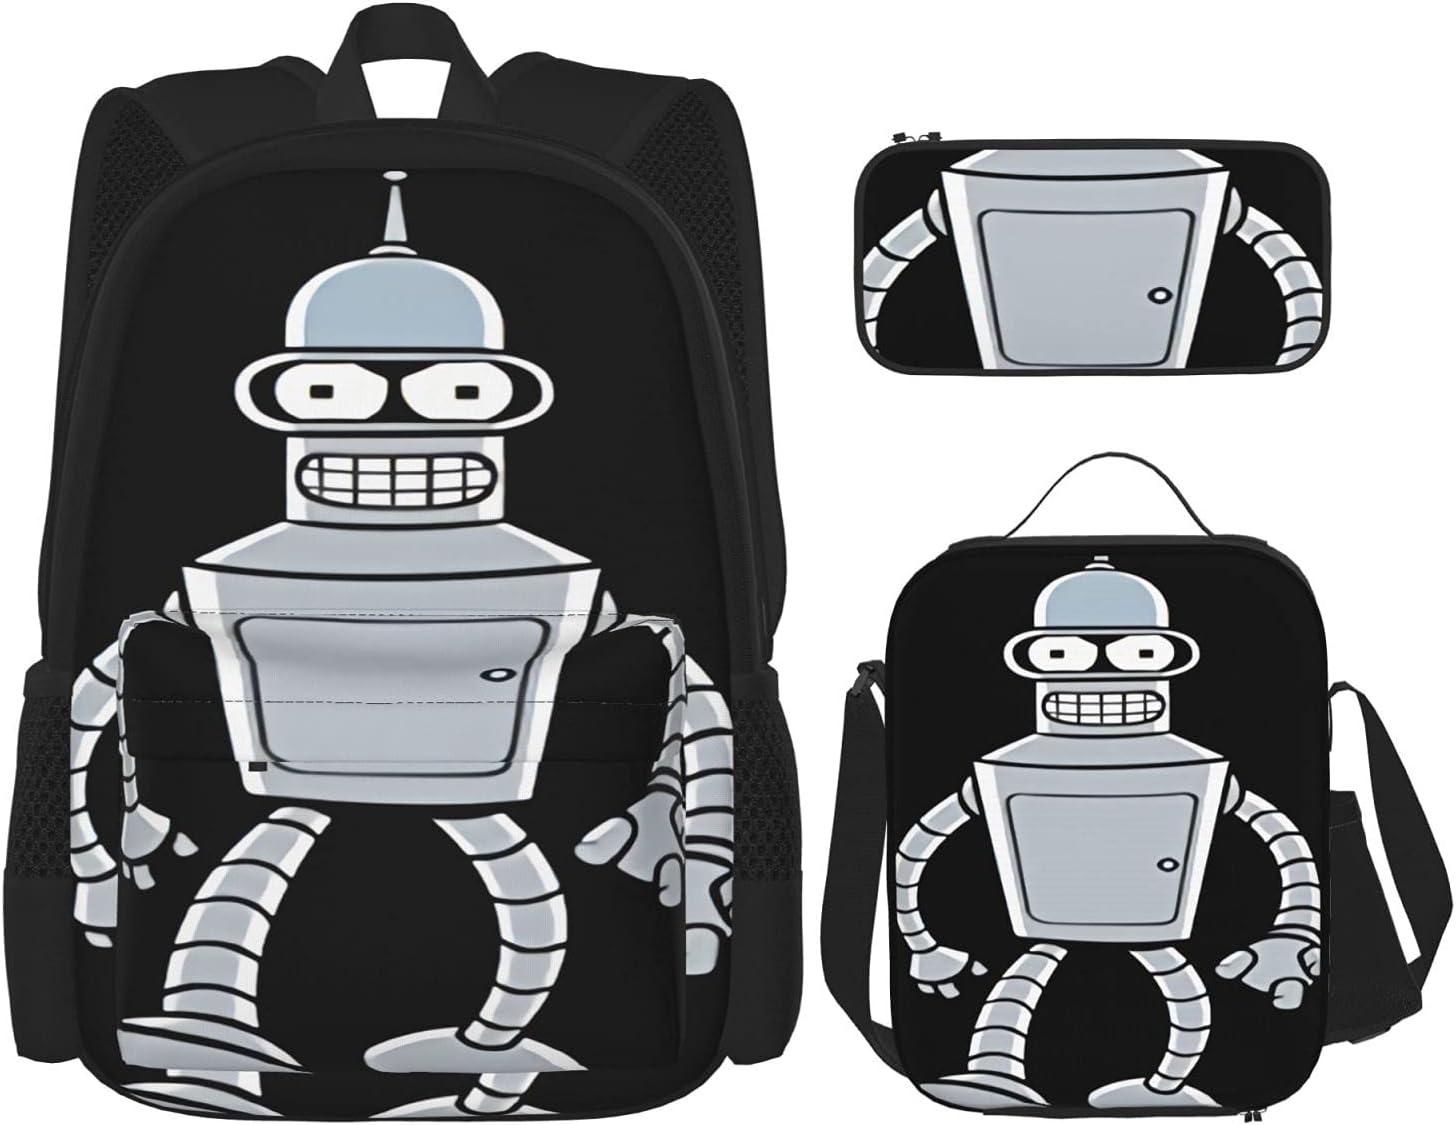 Dfhrtgre Futurama Bender Bending Rodriguezbackpack 3-Piece Albuquerque Mall T Set Soldering